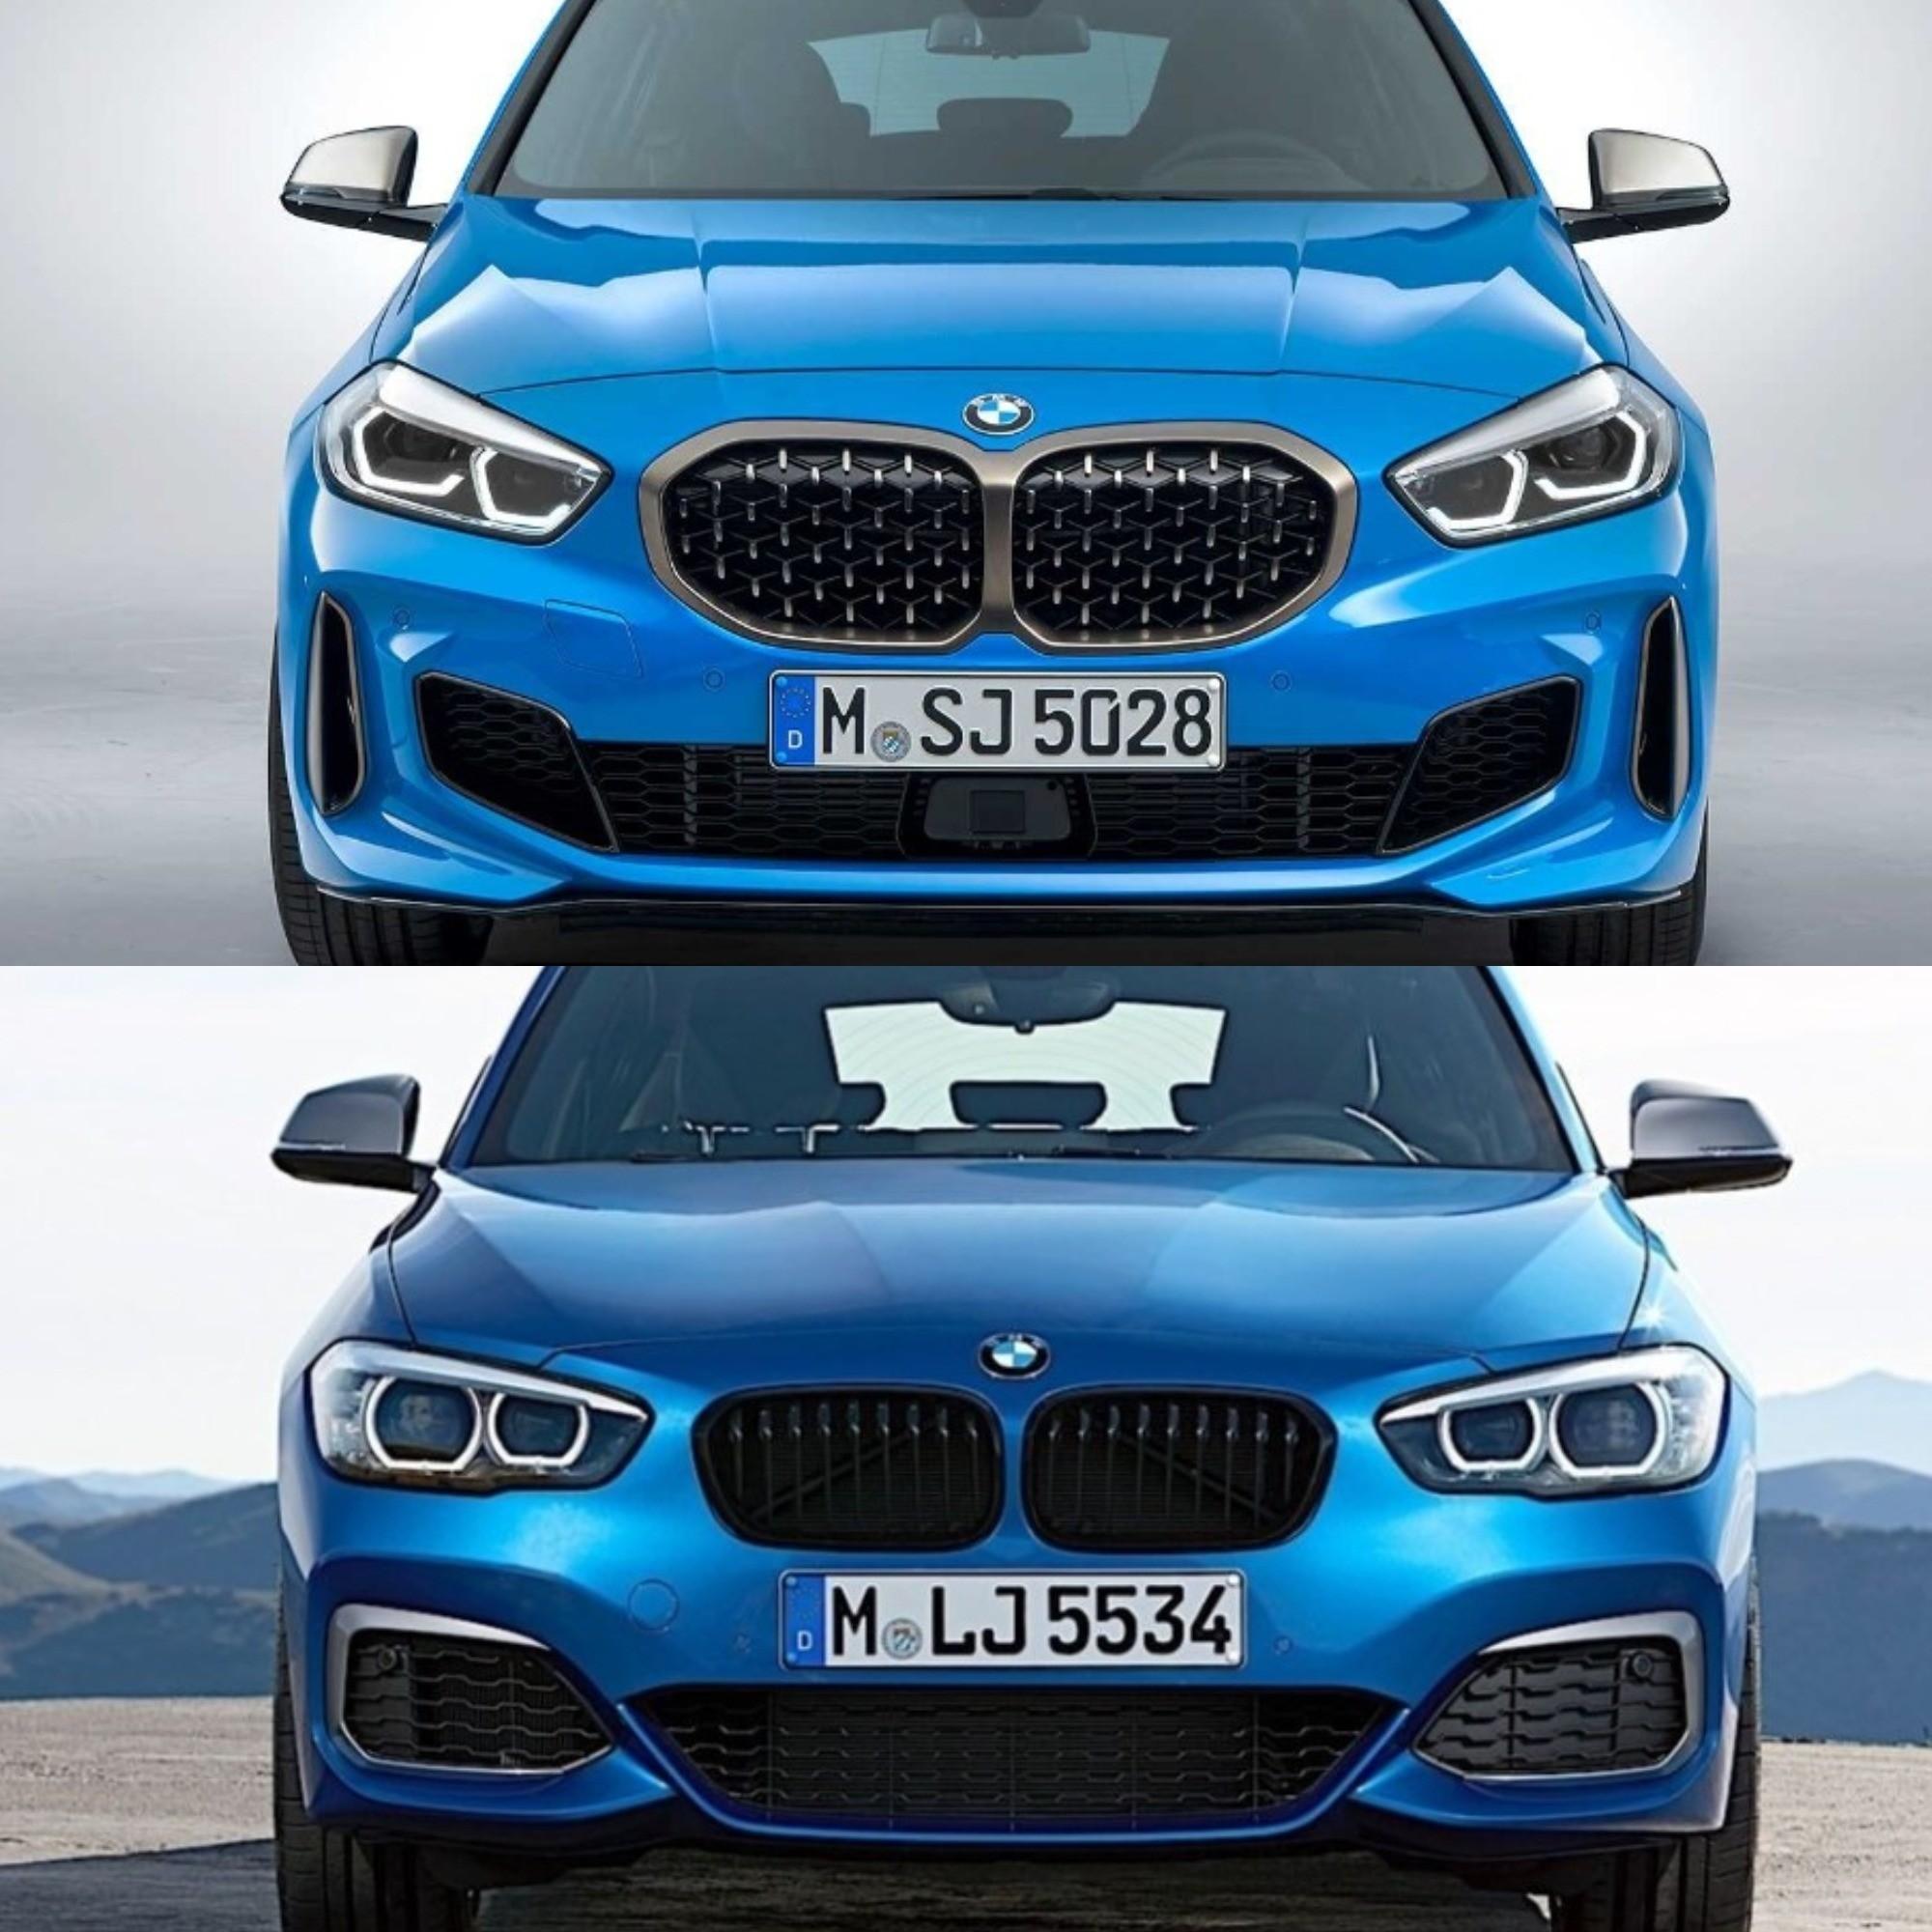 Photo Comparison: 2020 BMW 1 Series Vs. 2017 BMW 1 Series